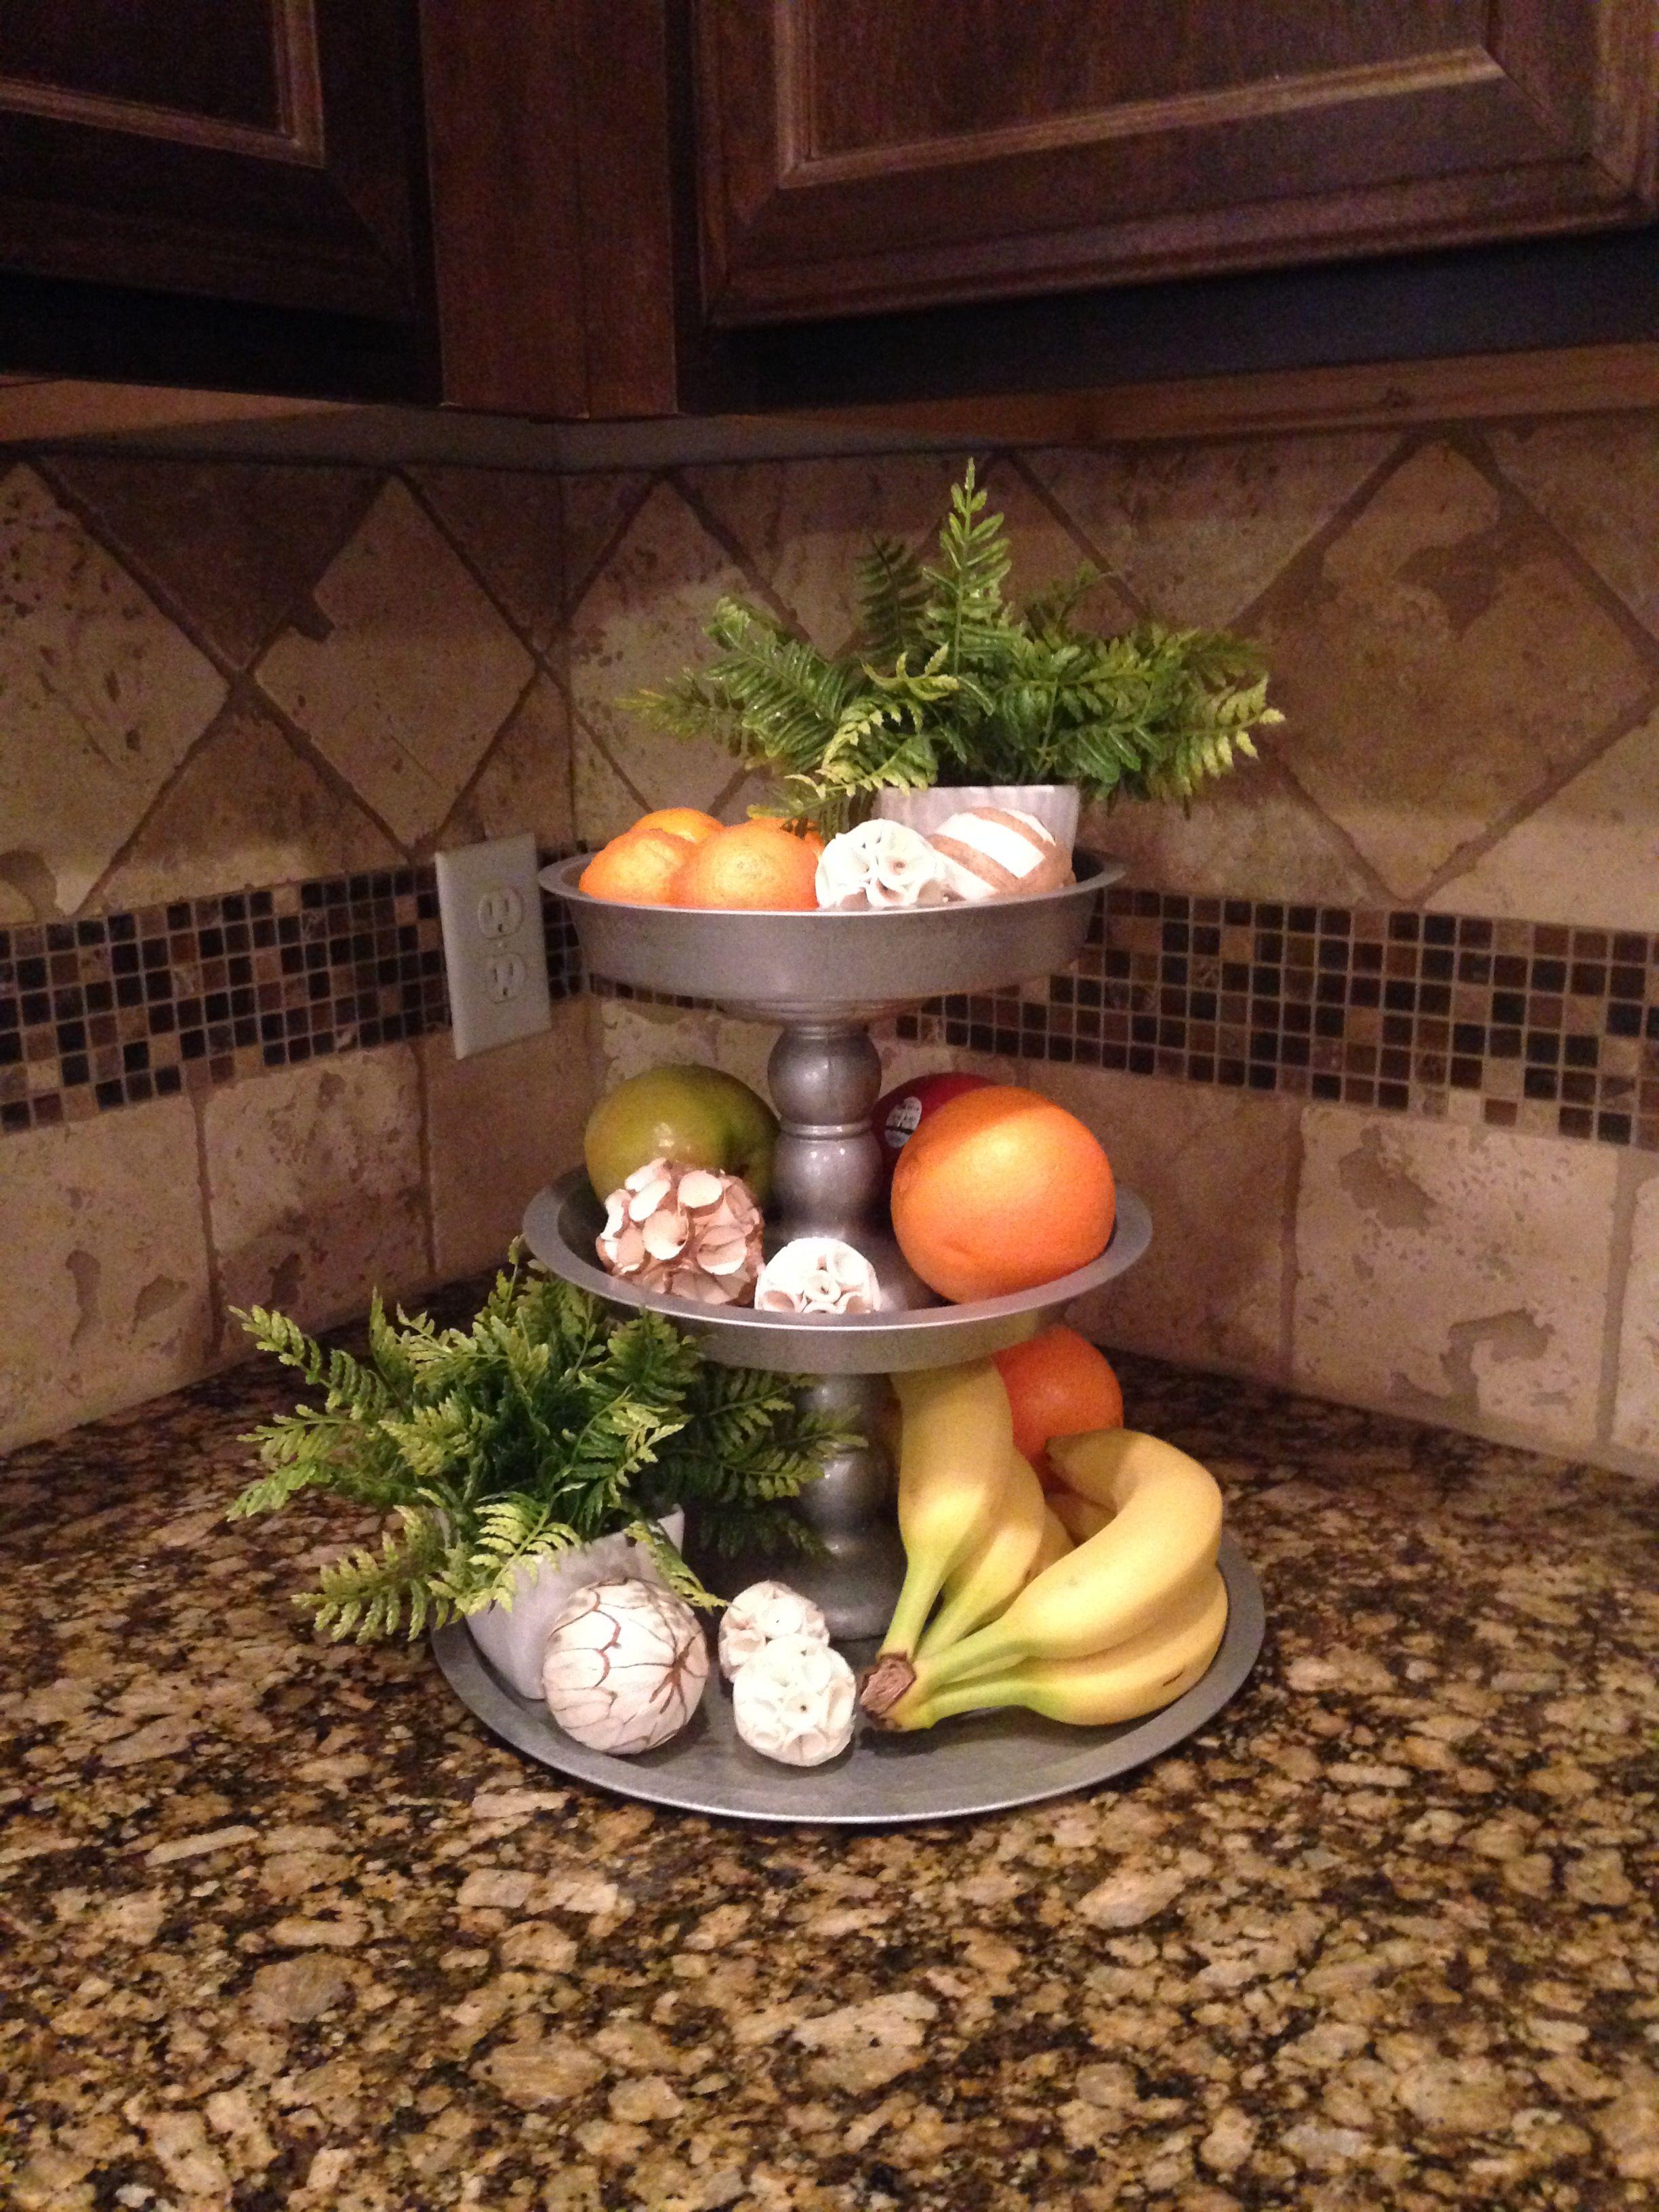 Dollar Tree DIY Three Tier Kitchen Stand decorations